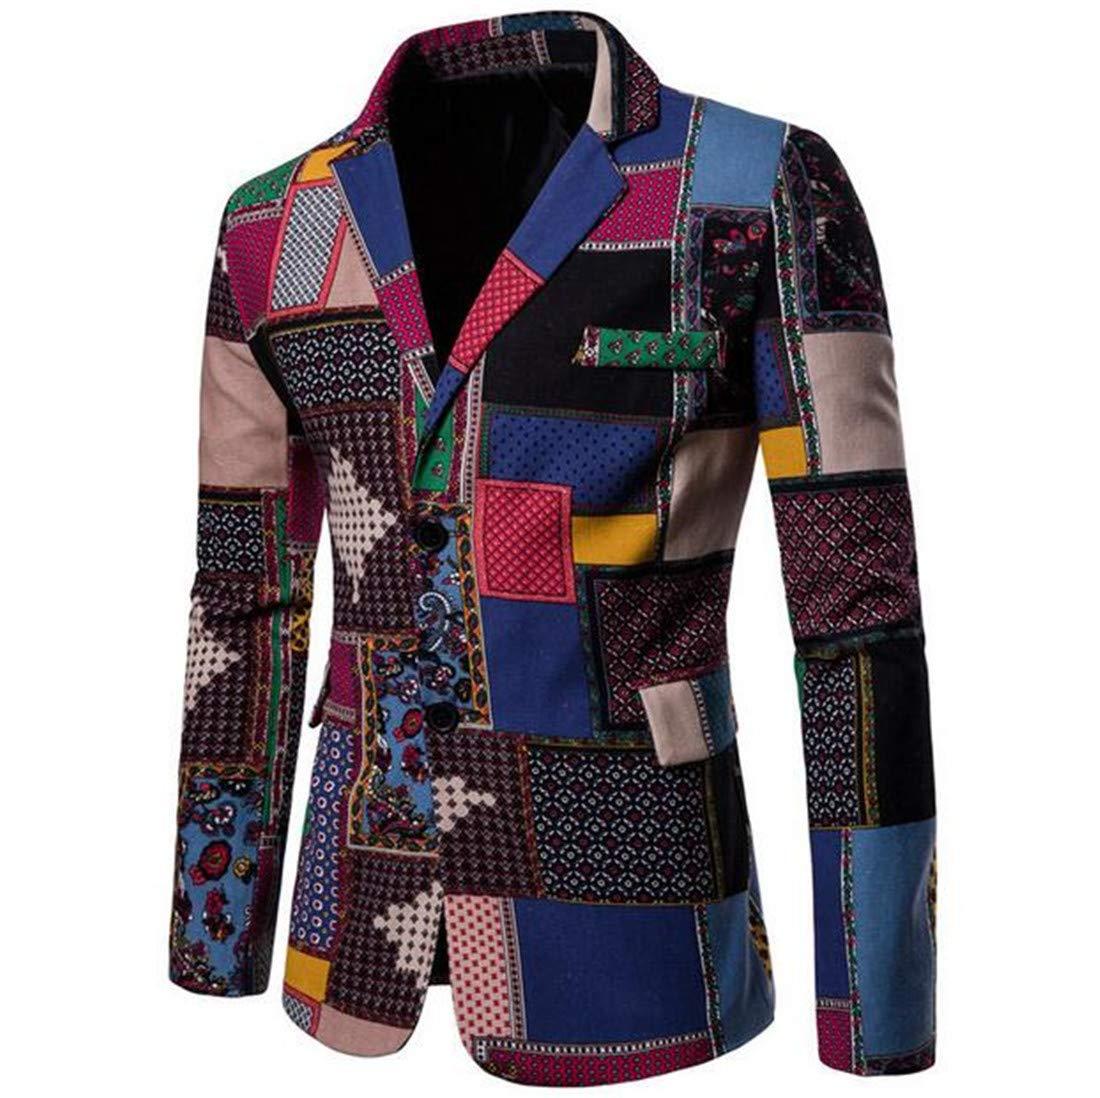 Domple Mens Long Sleeve African Dashiki Tuxedo Blazer Jacket Sport Coat Aspic US XL